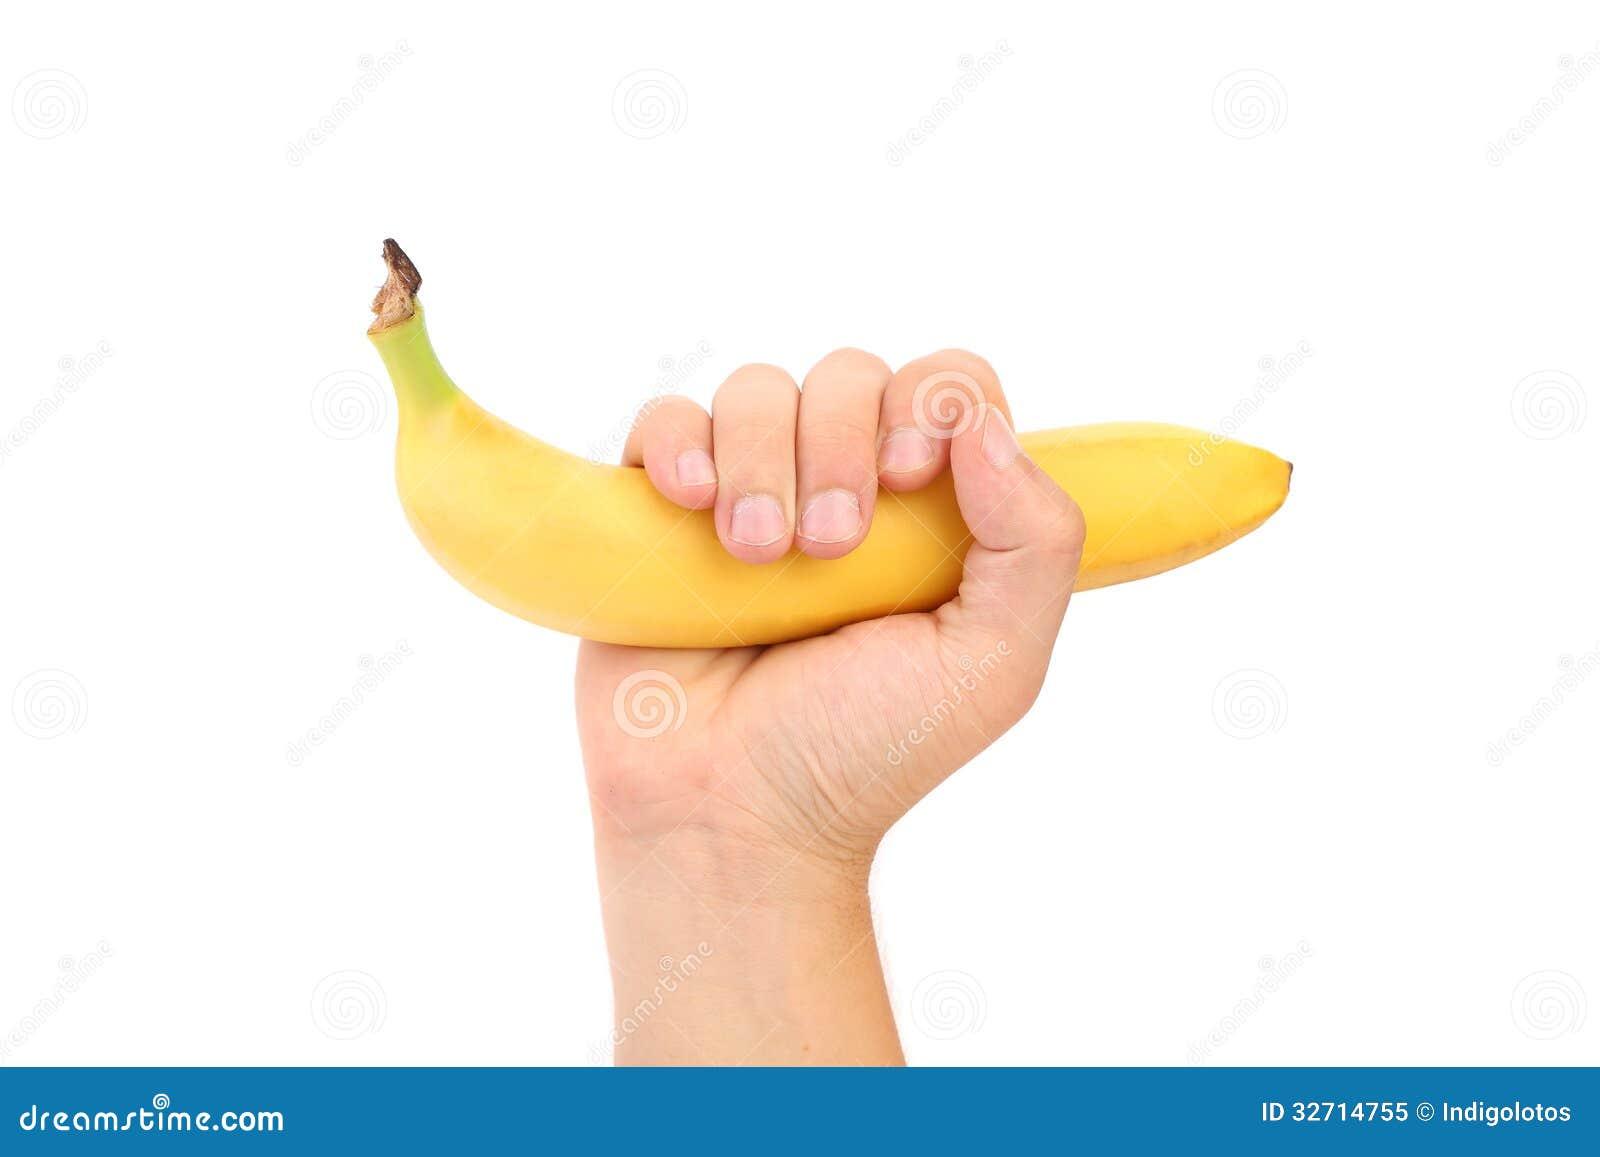 banana fruit gun hold in hand royalty free stock photos image